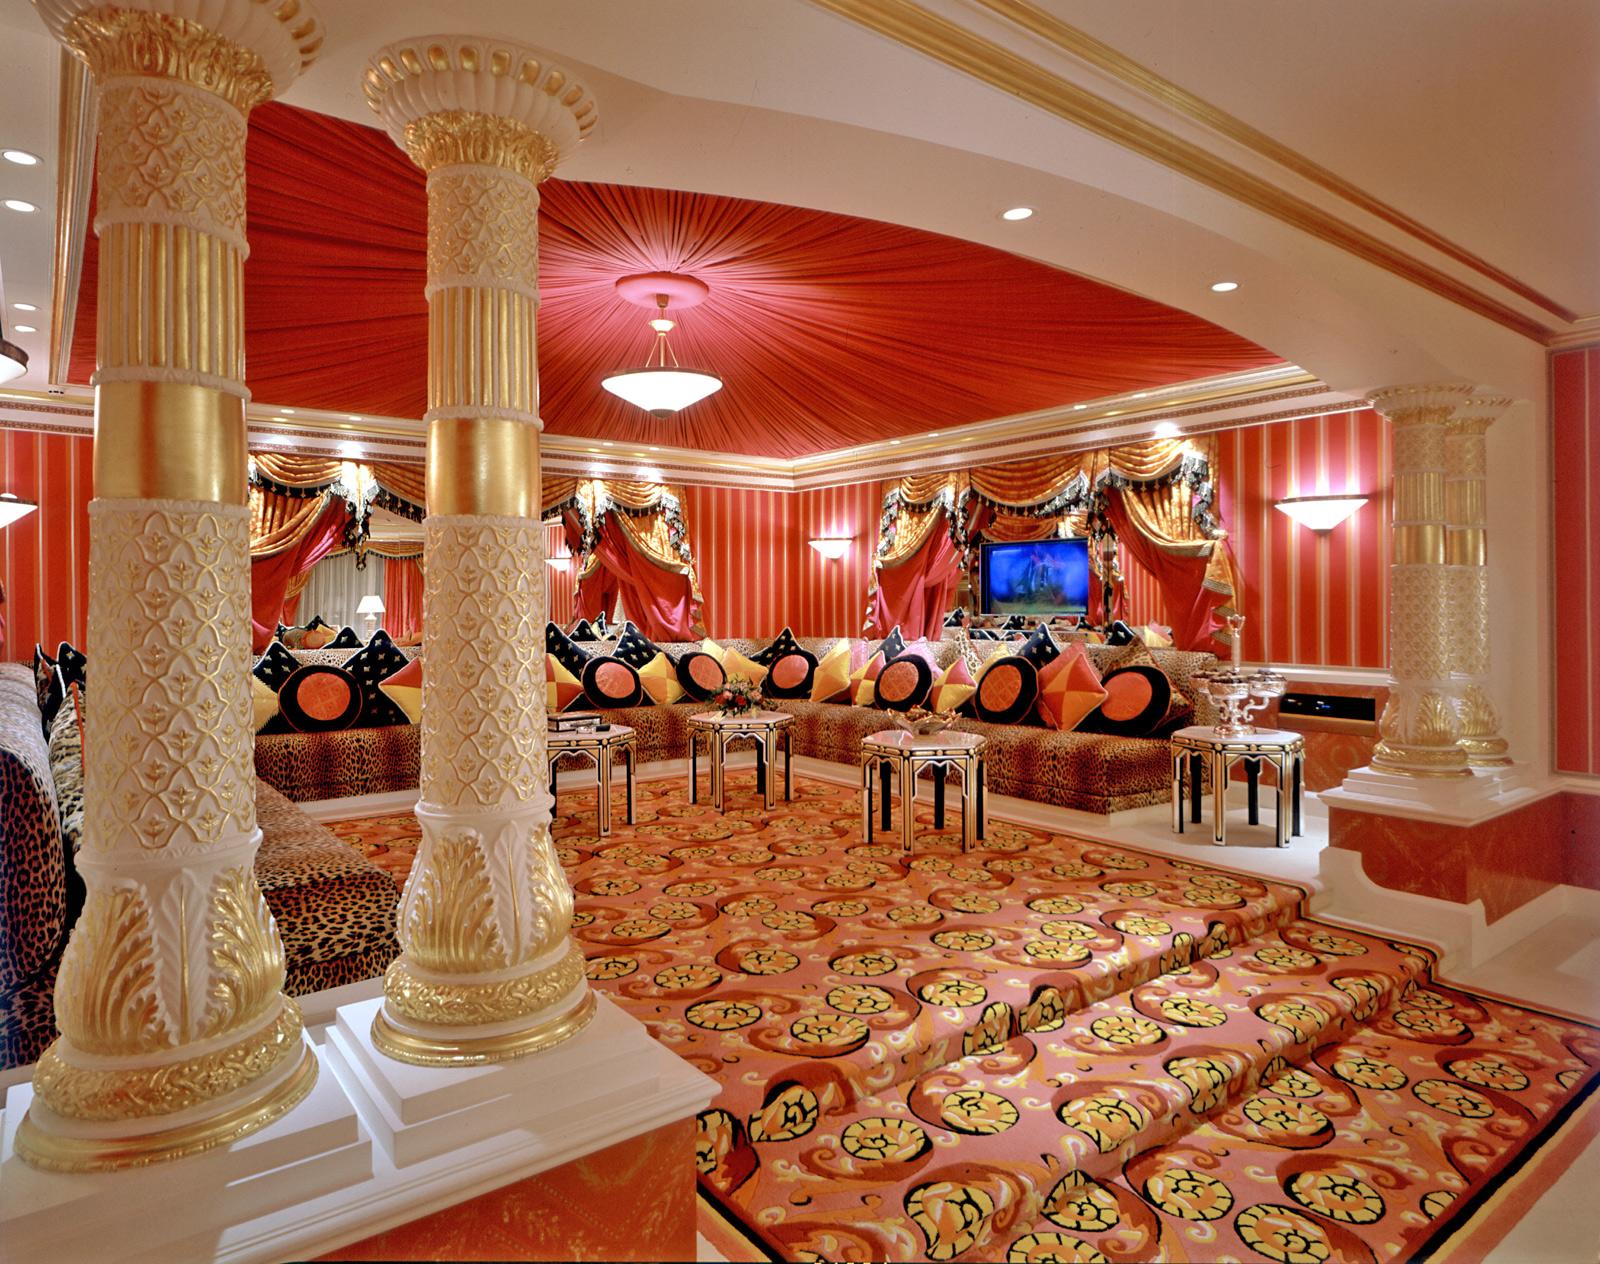 burj al arab luxury suite1 Optimized for Opulence: 7 Incredible Hotel Designs